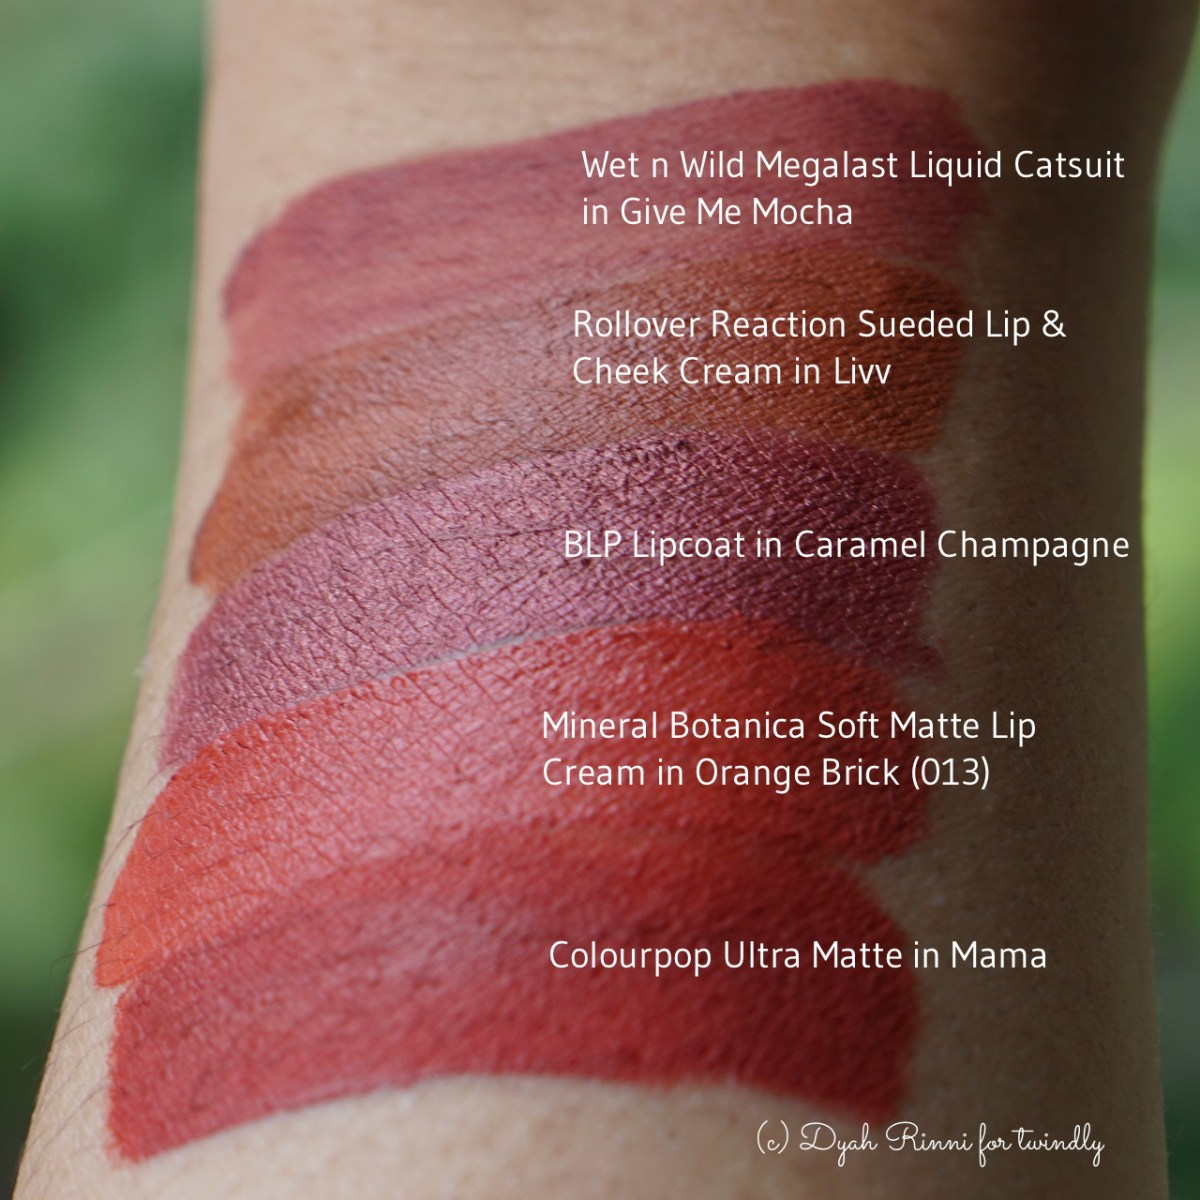 Indonesian Matte Lip Cream Swatch